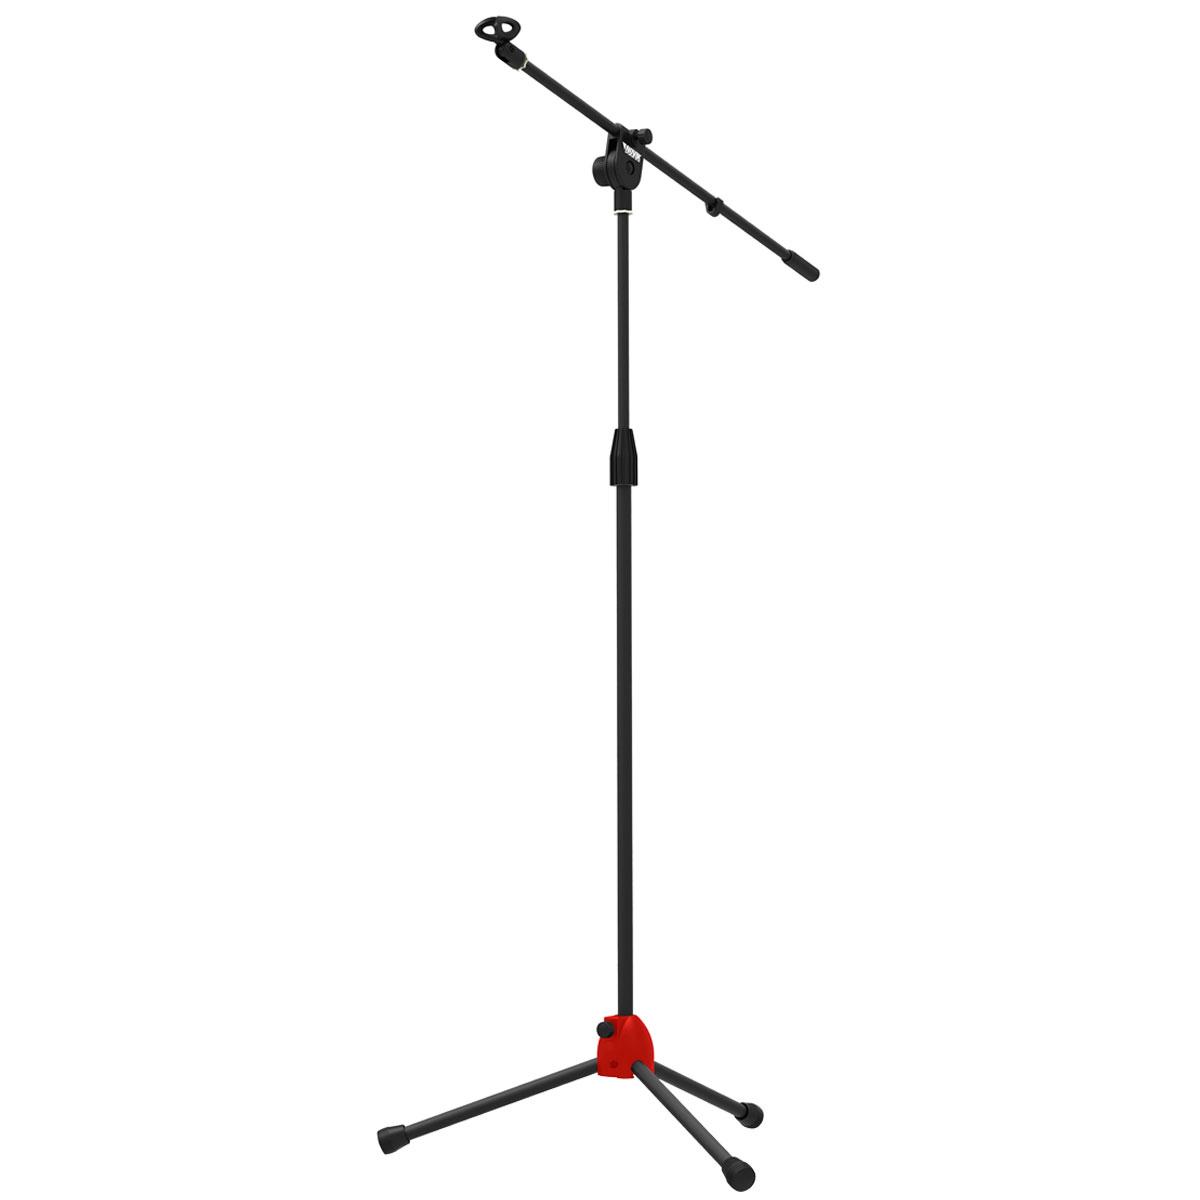 SNKM1 - Pedestal p/ Microfone tipo Girafa SNK M1 - Novik Neo